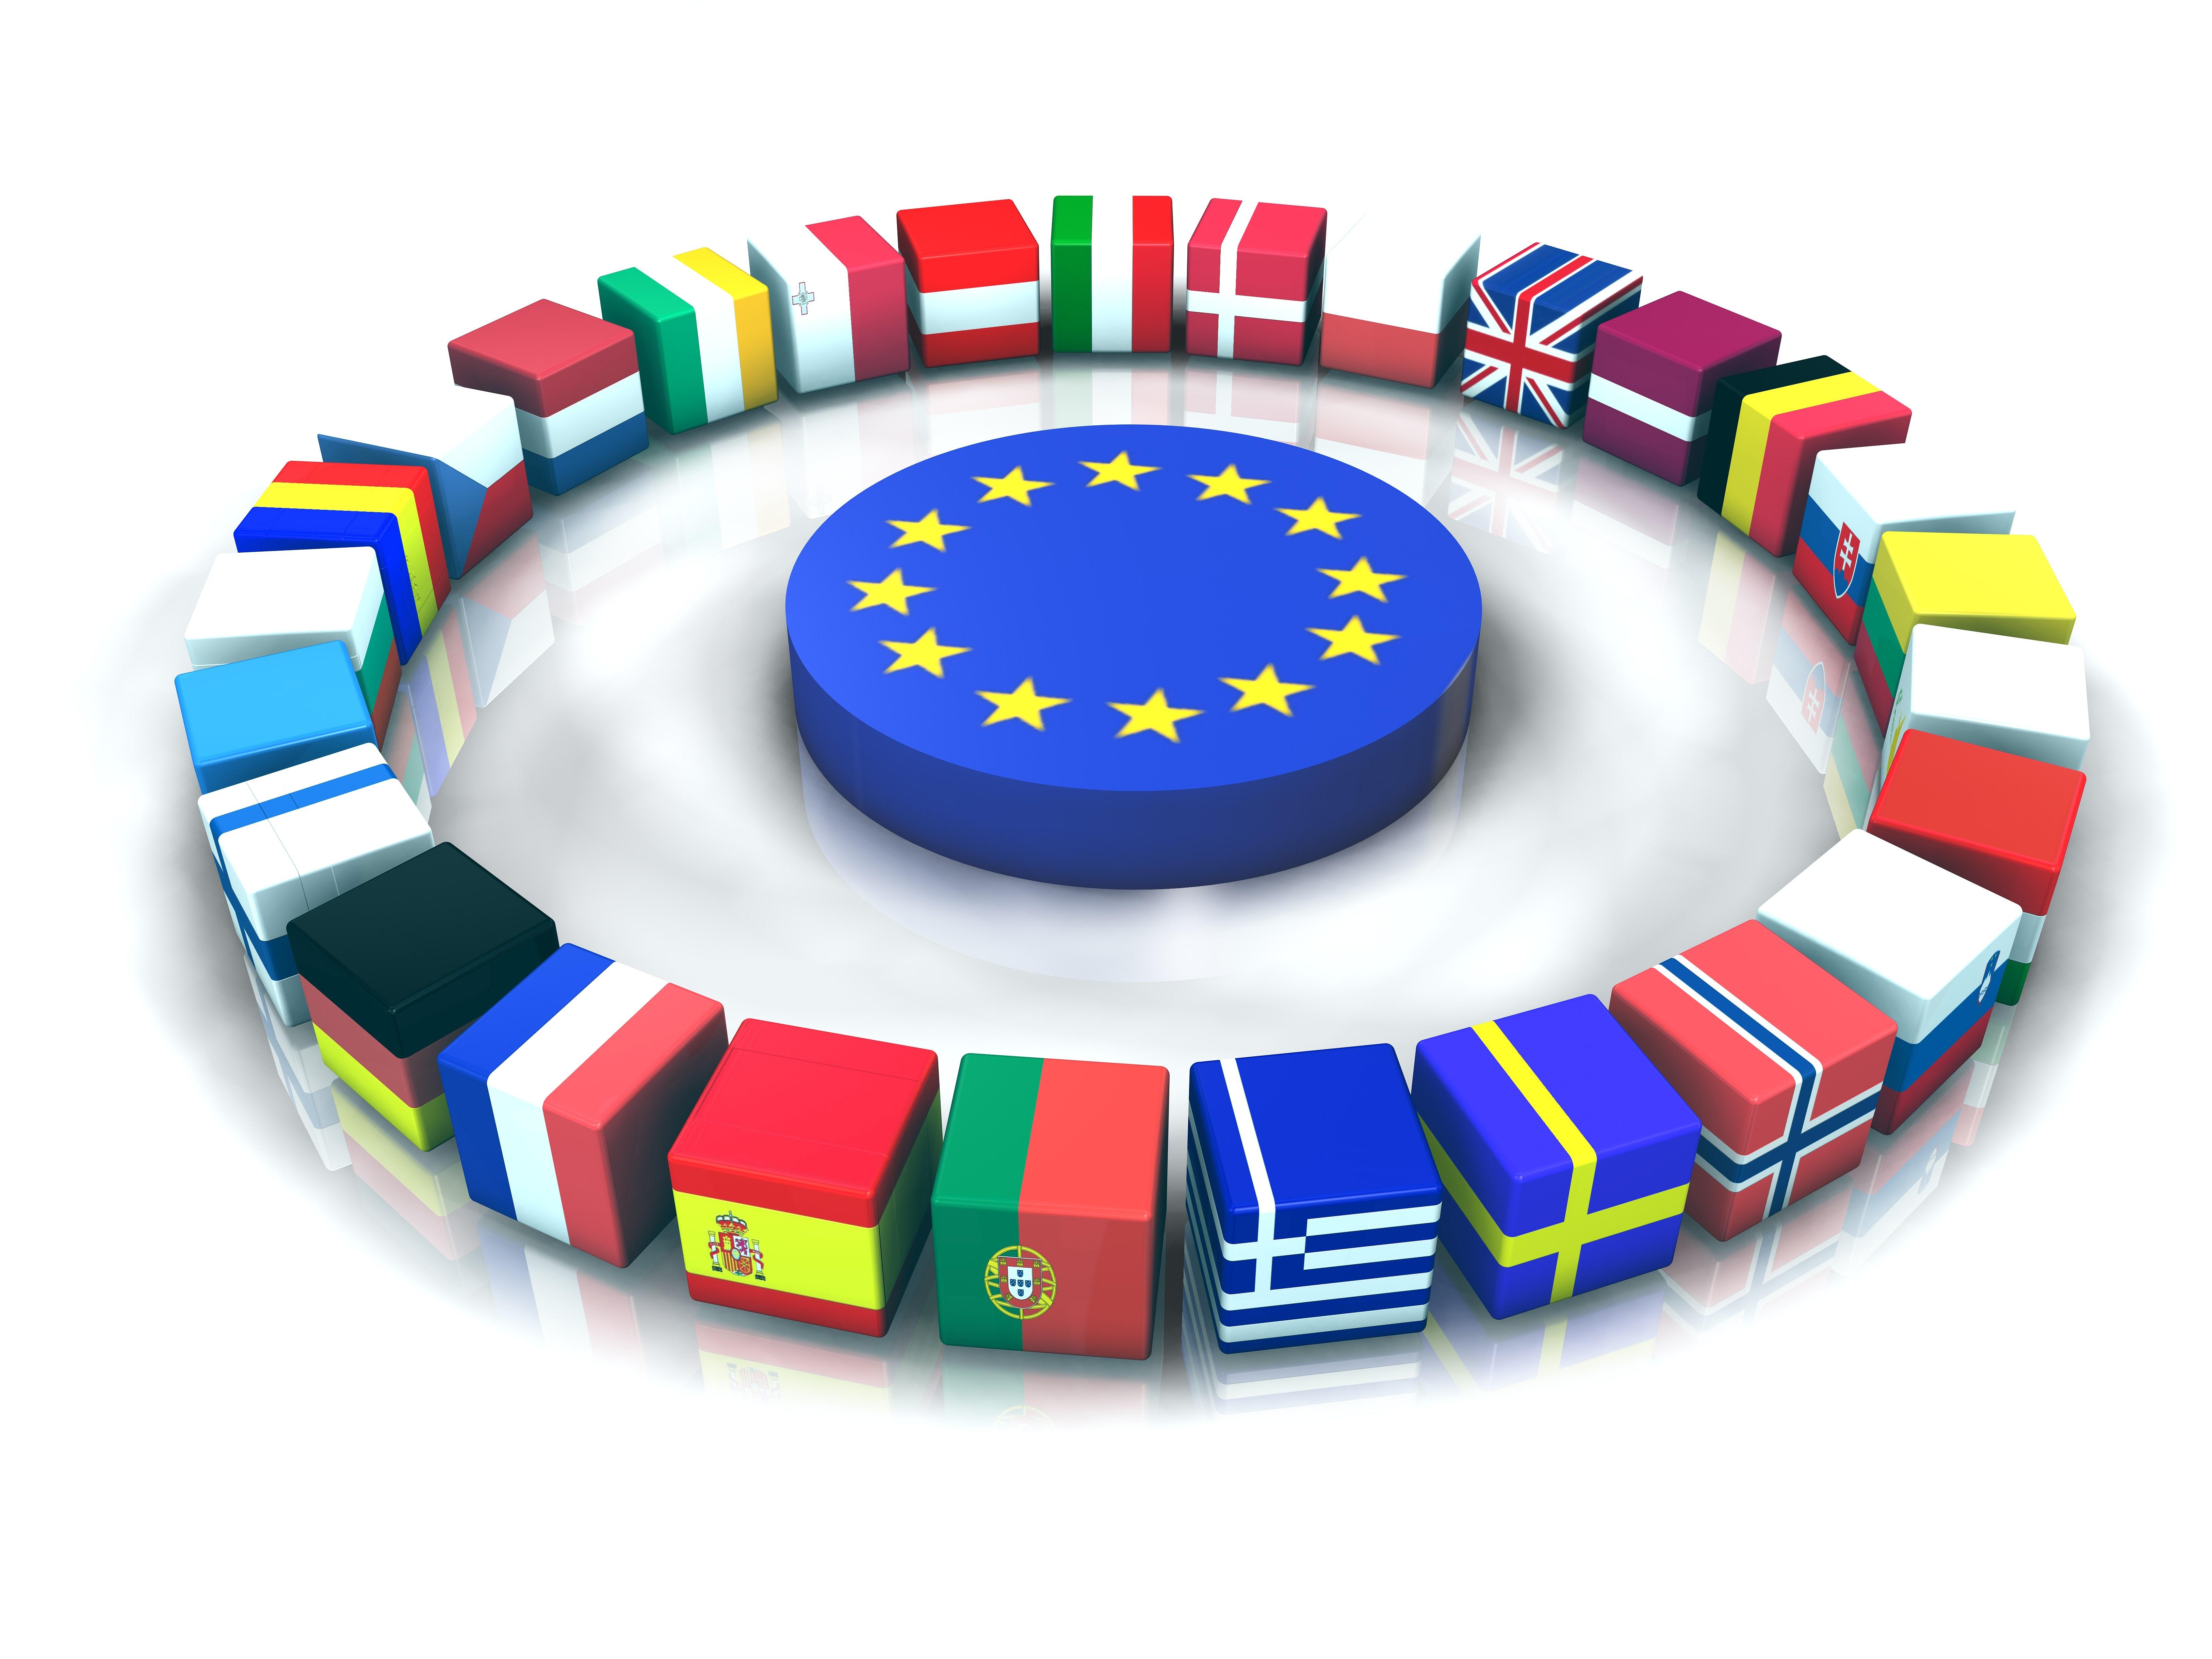 http://www.itespresso.fr/wp-content/uploads/2011/10/Commission-europ%C3%A9enne-UE-EU-Europe-Union-Europ%C3%A9enne-%C2%A9-morganimation-Fotolia.com_.jpg